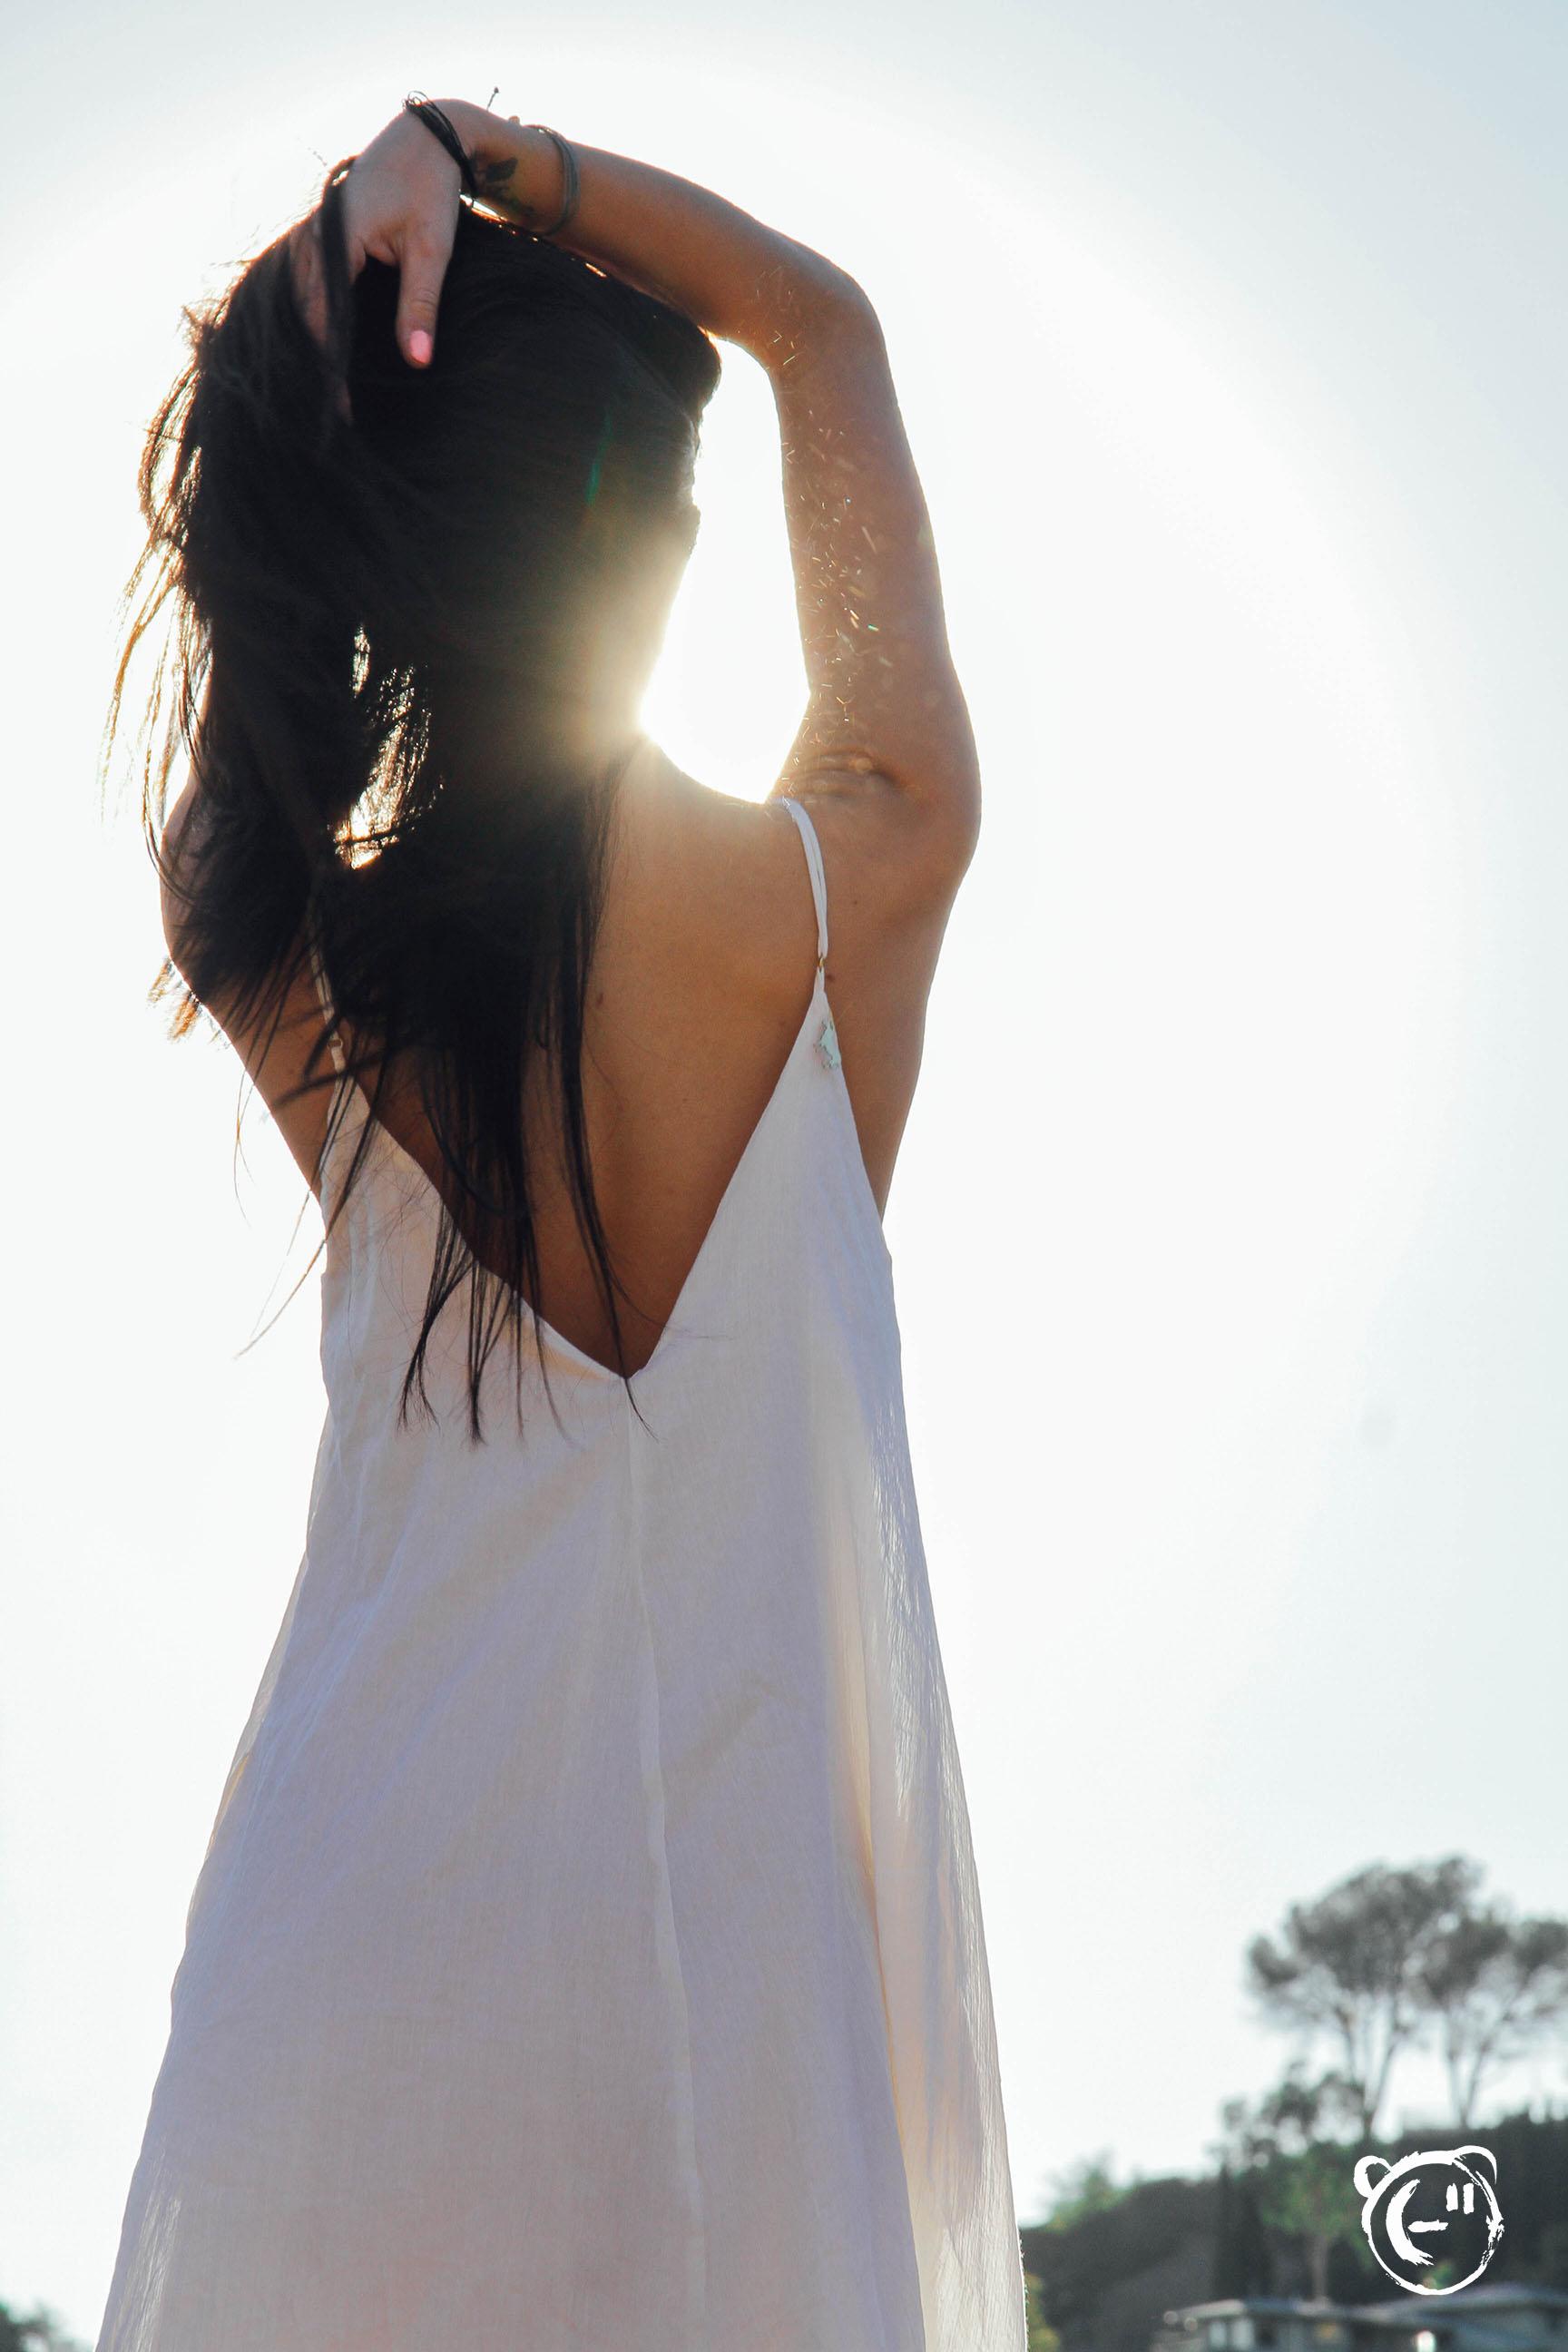 Kaloopy _ Soaking up the Sun 23.jpg